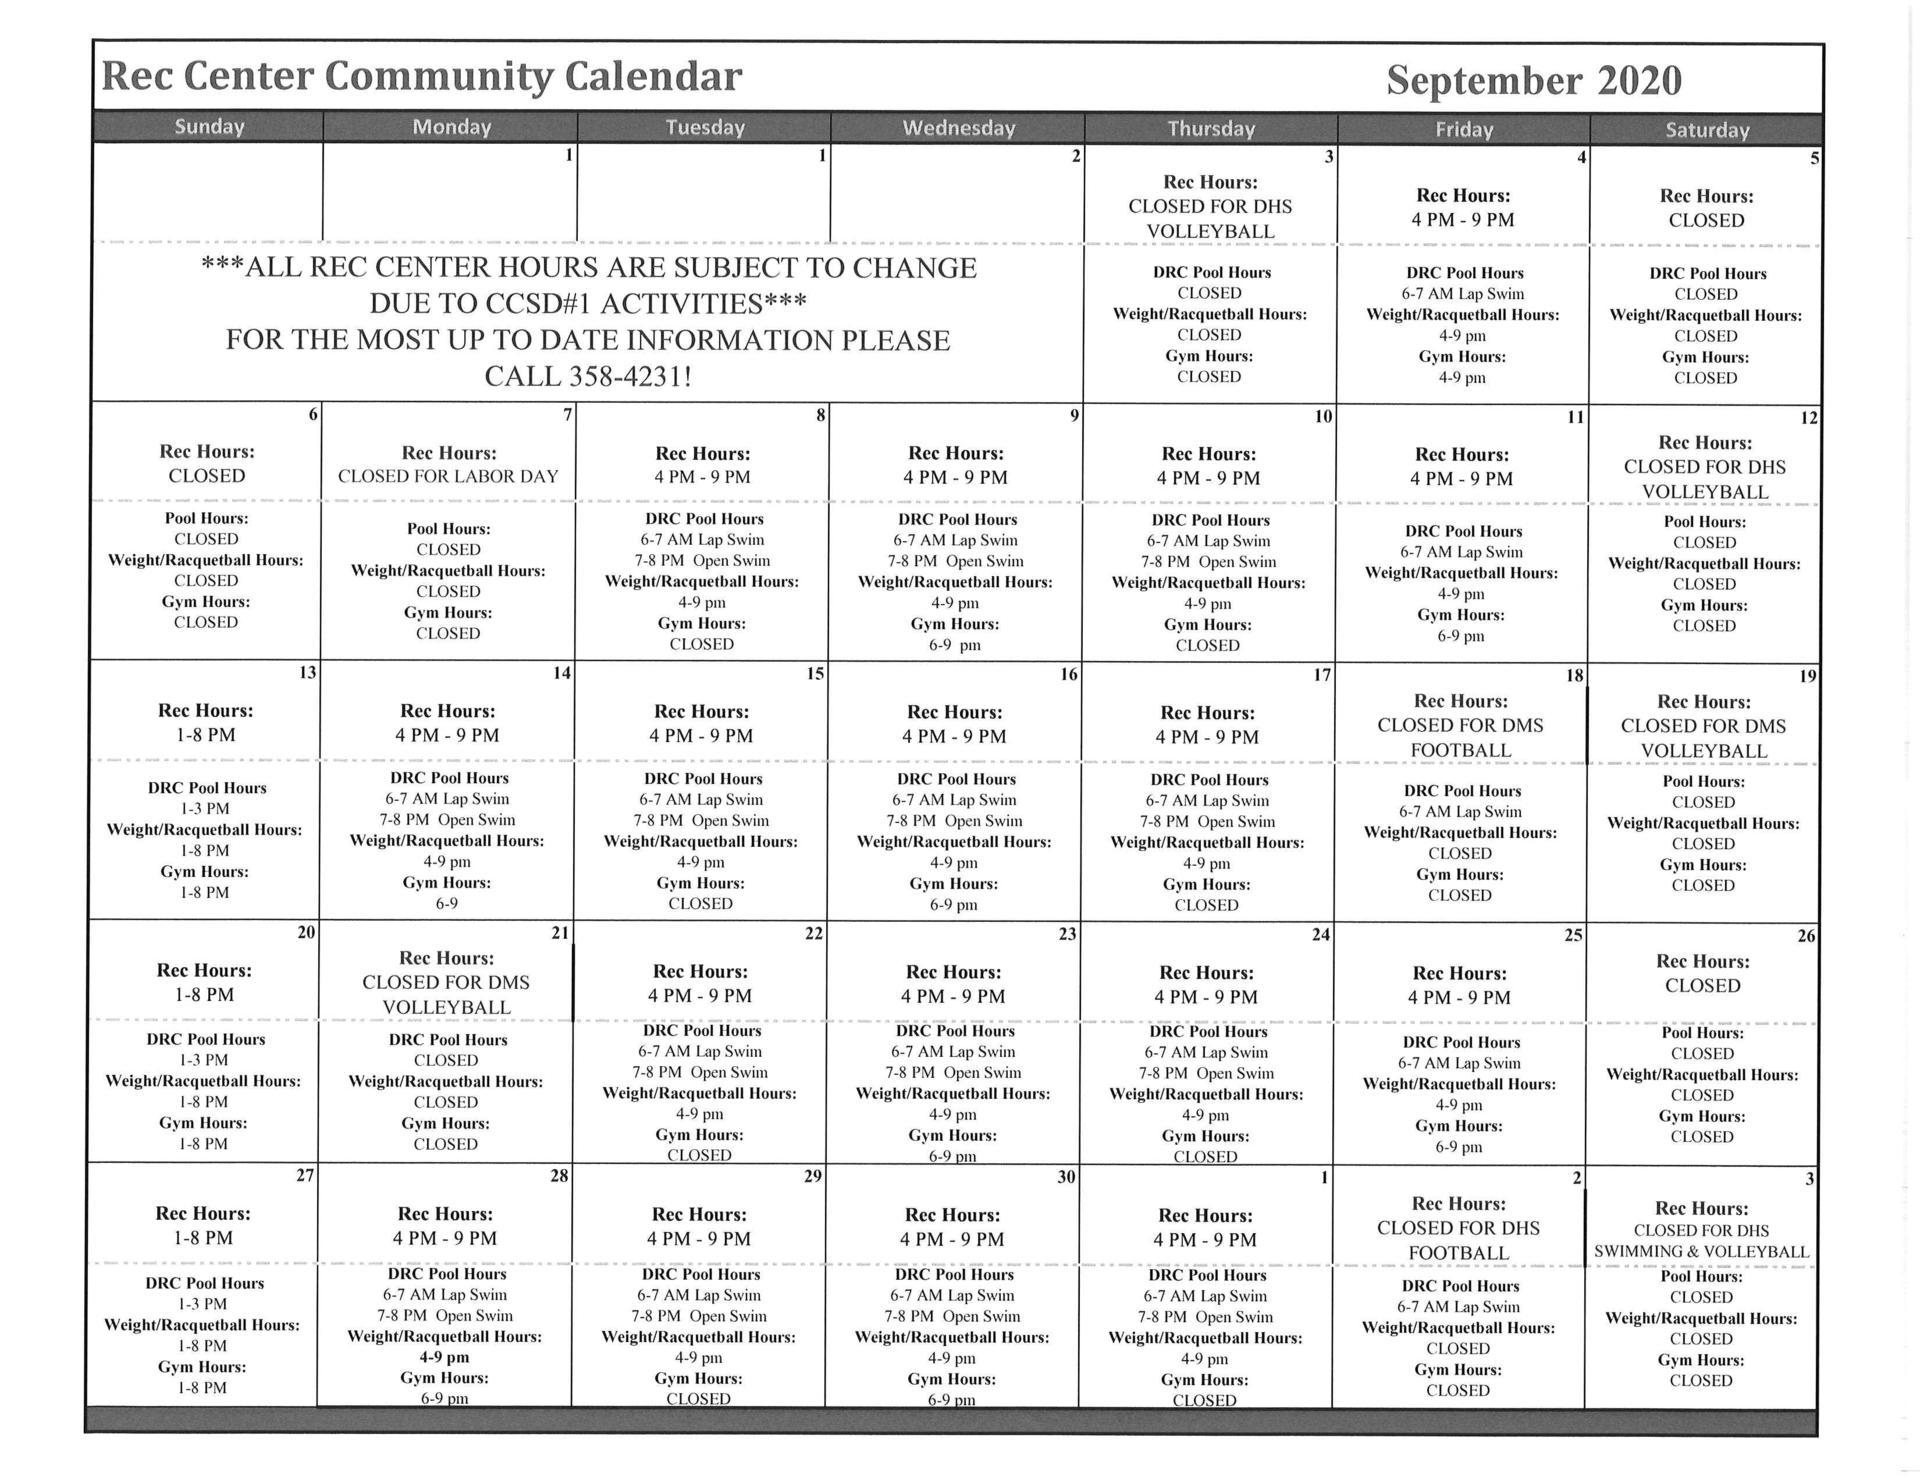 September 2020 Building Hours